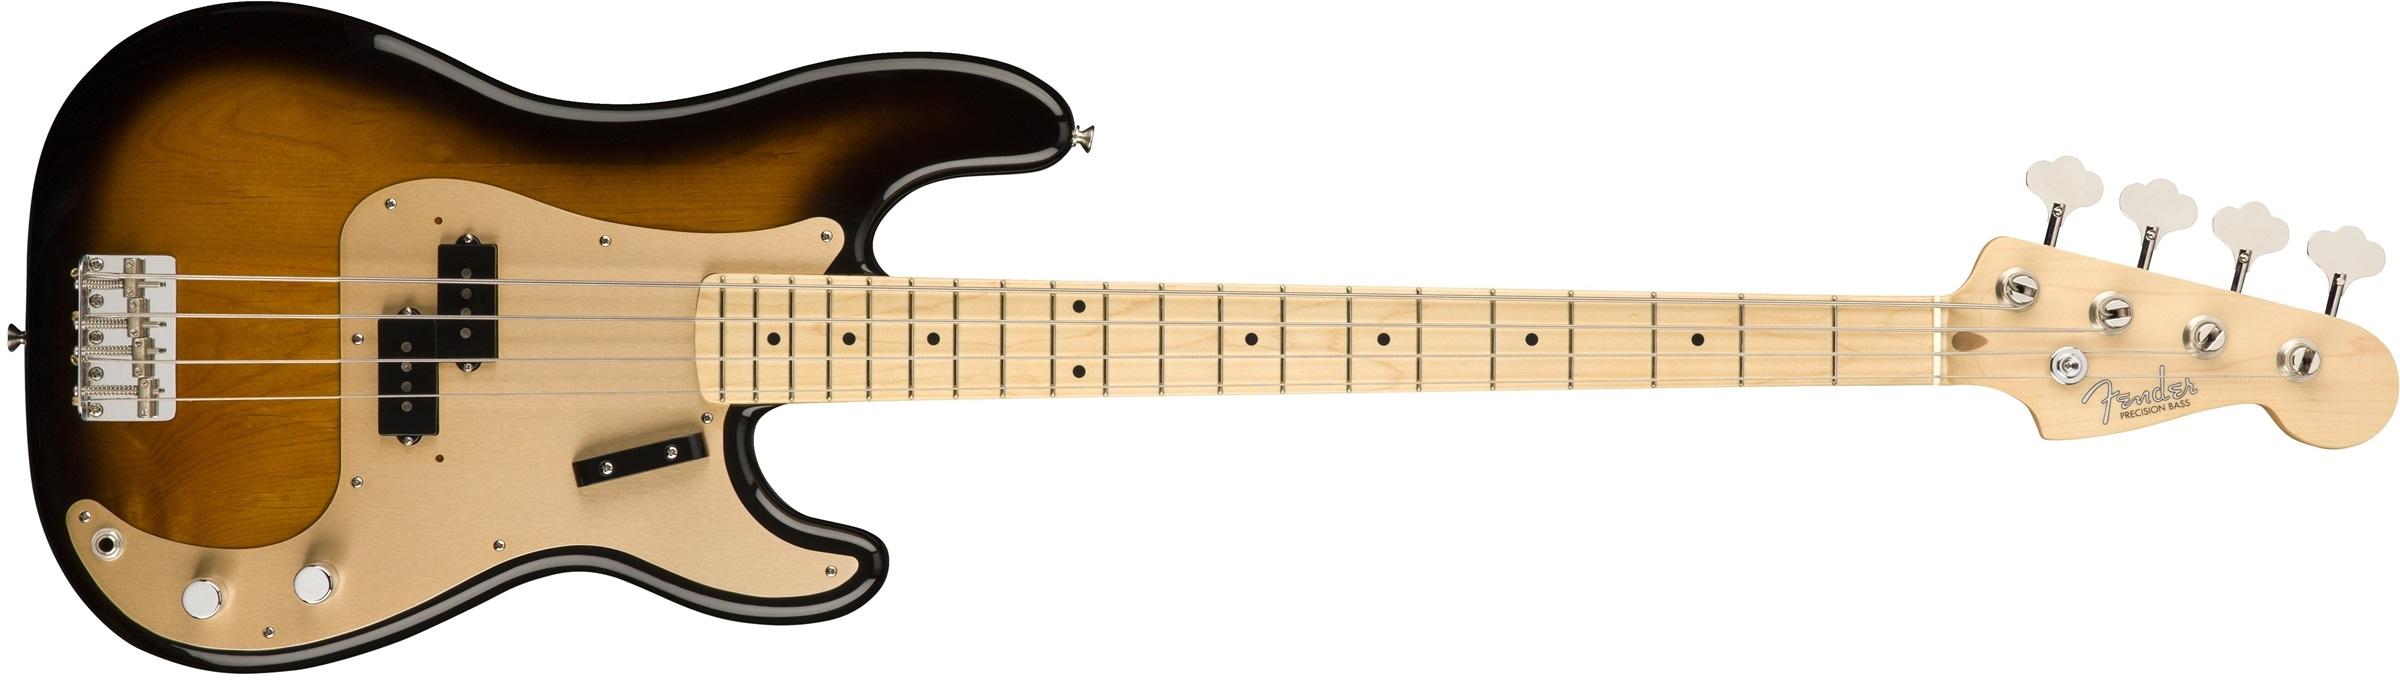 Fender American Original 50s Precision Bass MN 2TSB